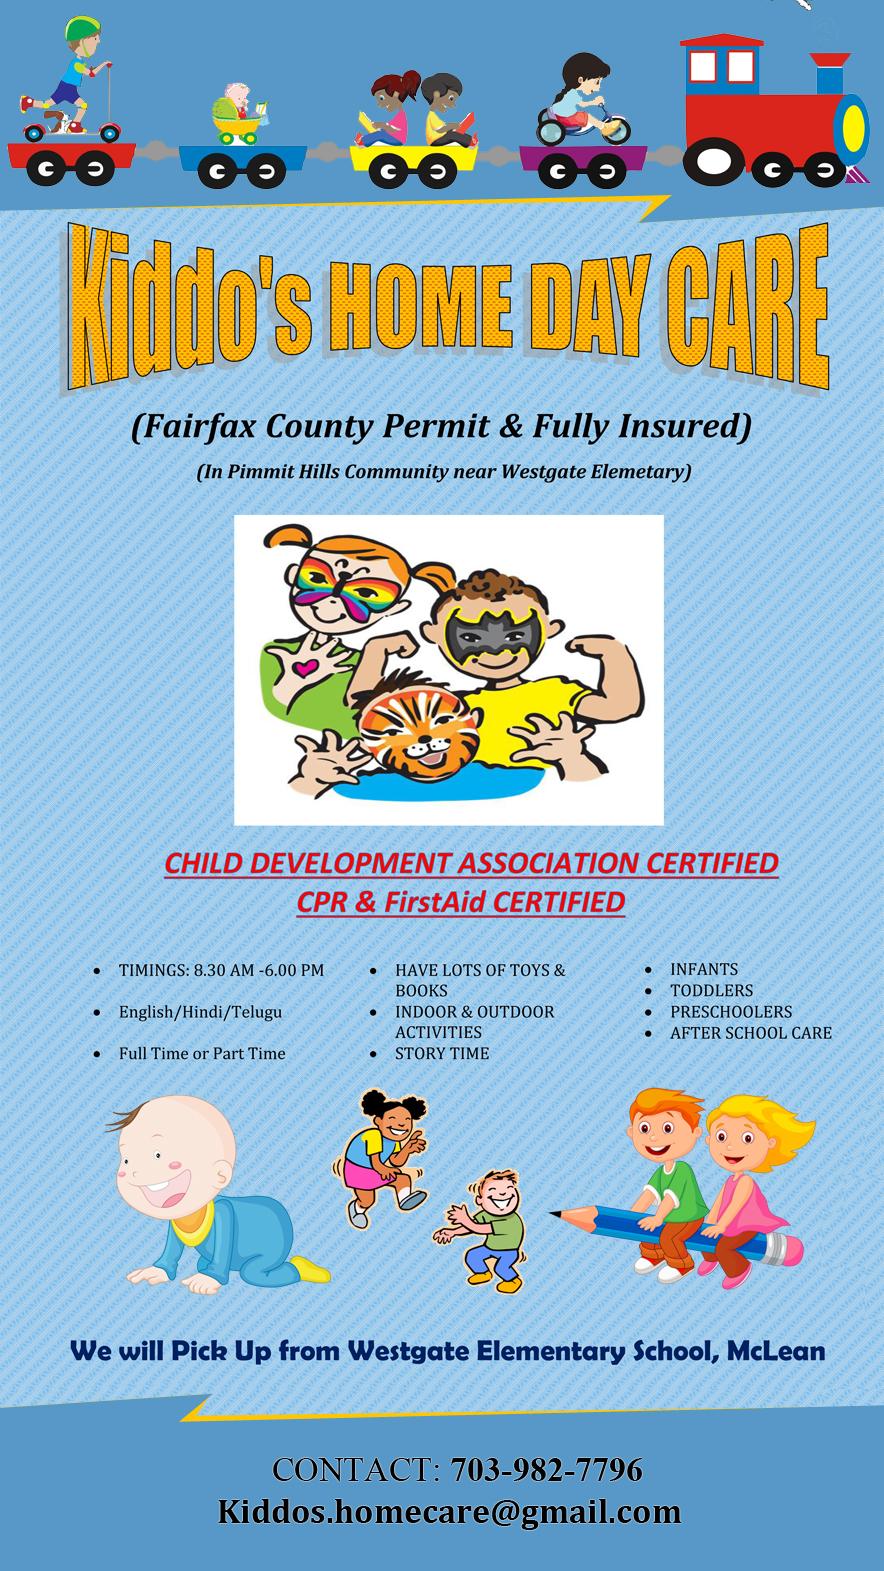 Kiddos home daycare in falls church va kiddos home daycare aboutkiddos home daycare xflitez Image collections